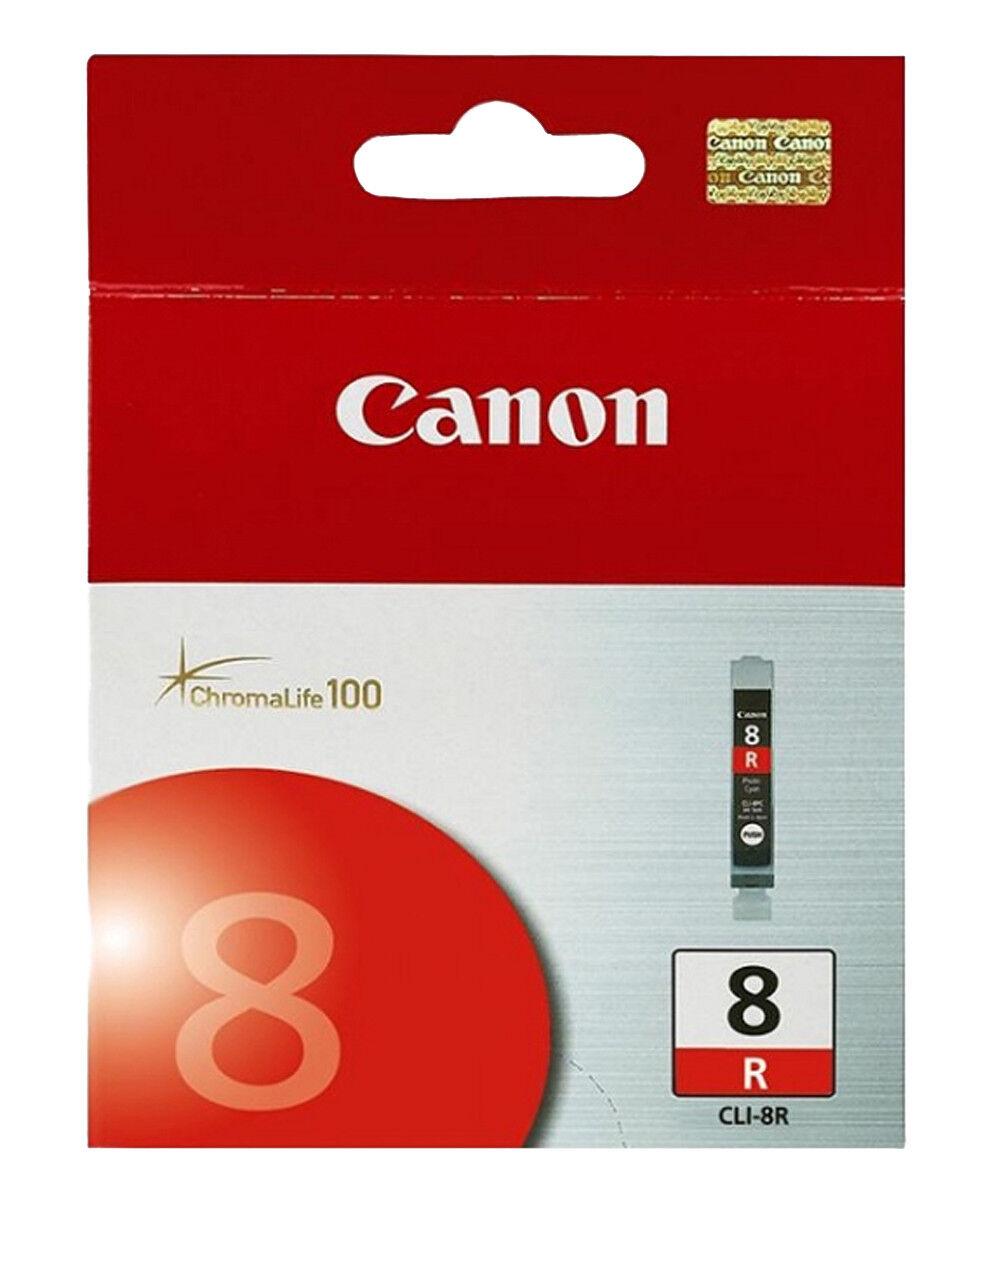 NEW 8PACK GENUINE CANON PIXMA CLI-8 BK M C Y PM PC R G Pro9000 INK CARTRIDGE OEM